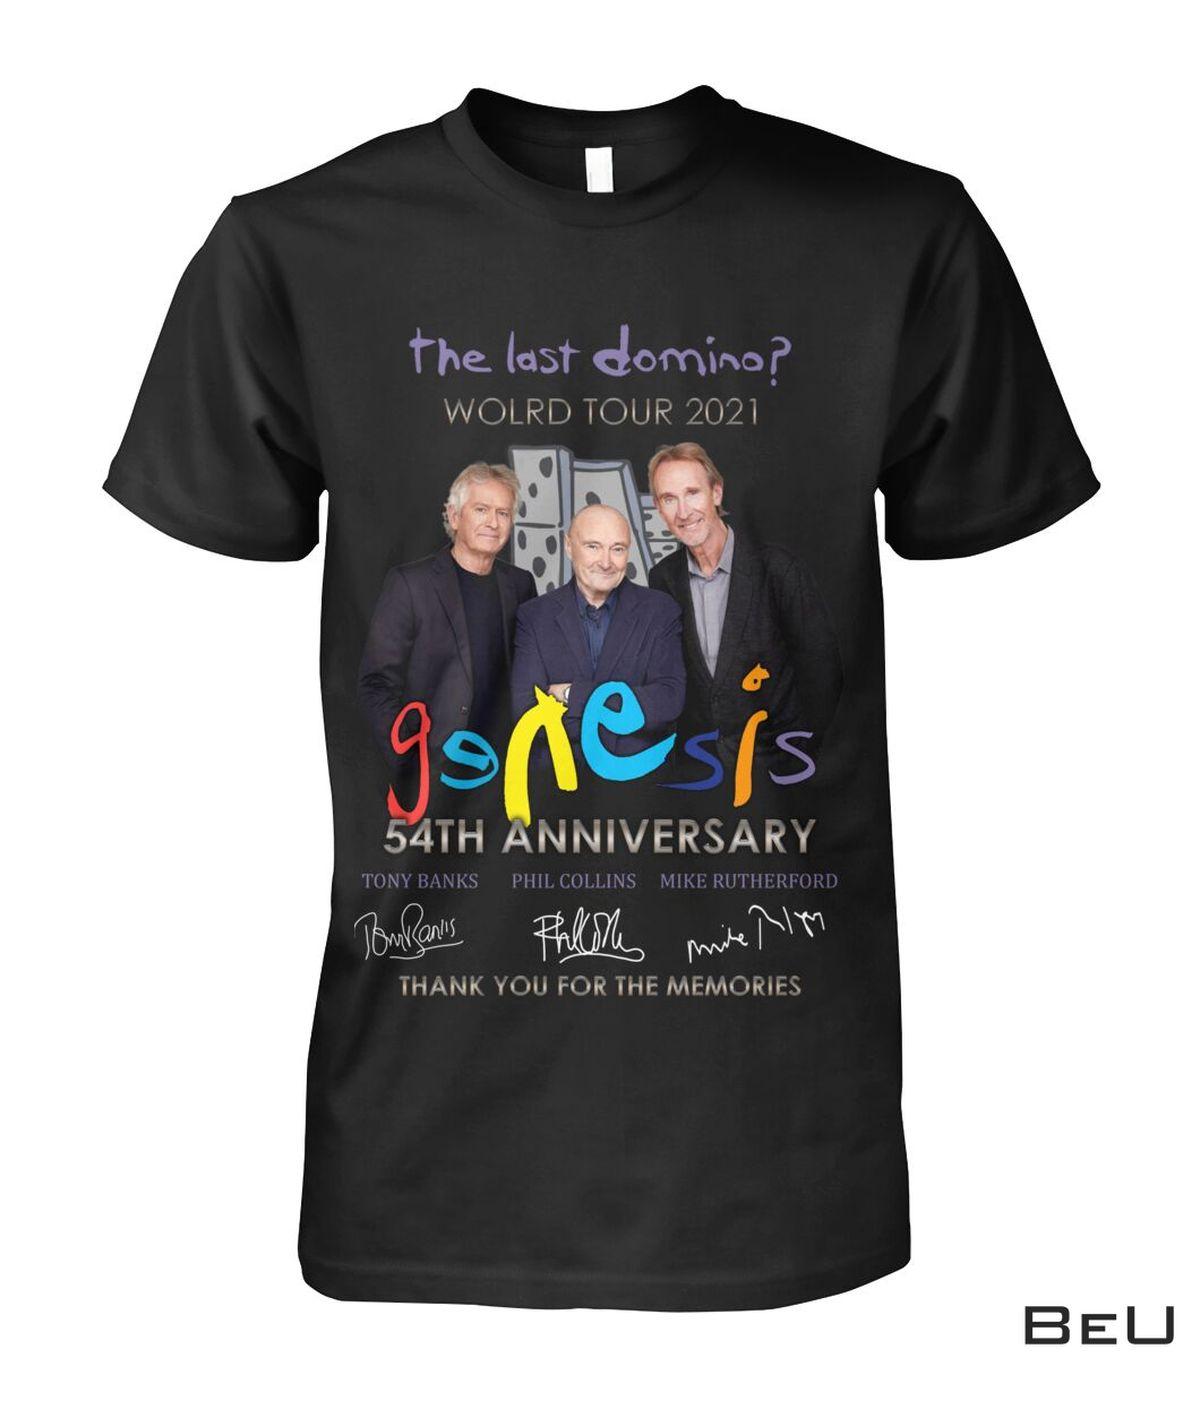 Best Gift Genesis The Last World Tour 2021 Shirt, hoodie, tank top